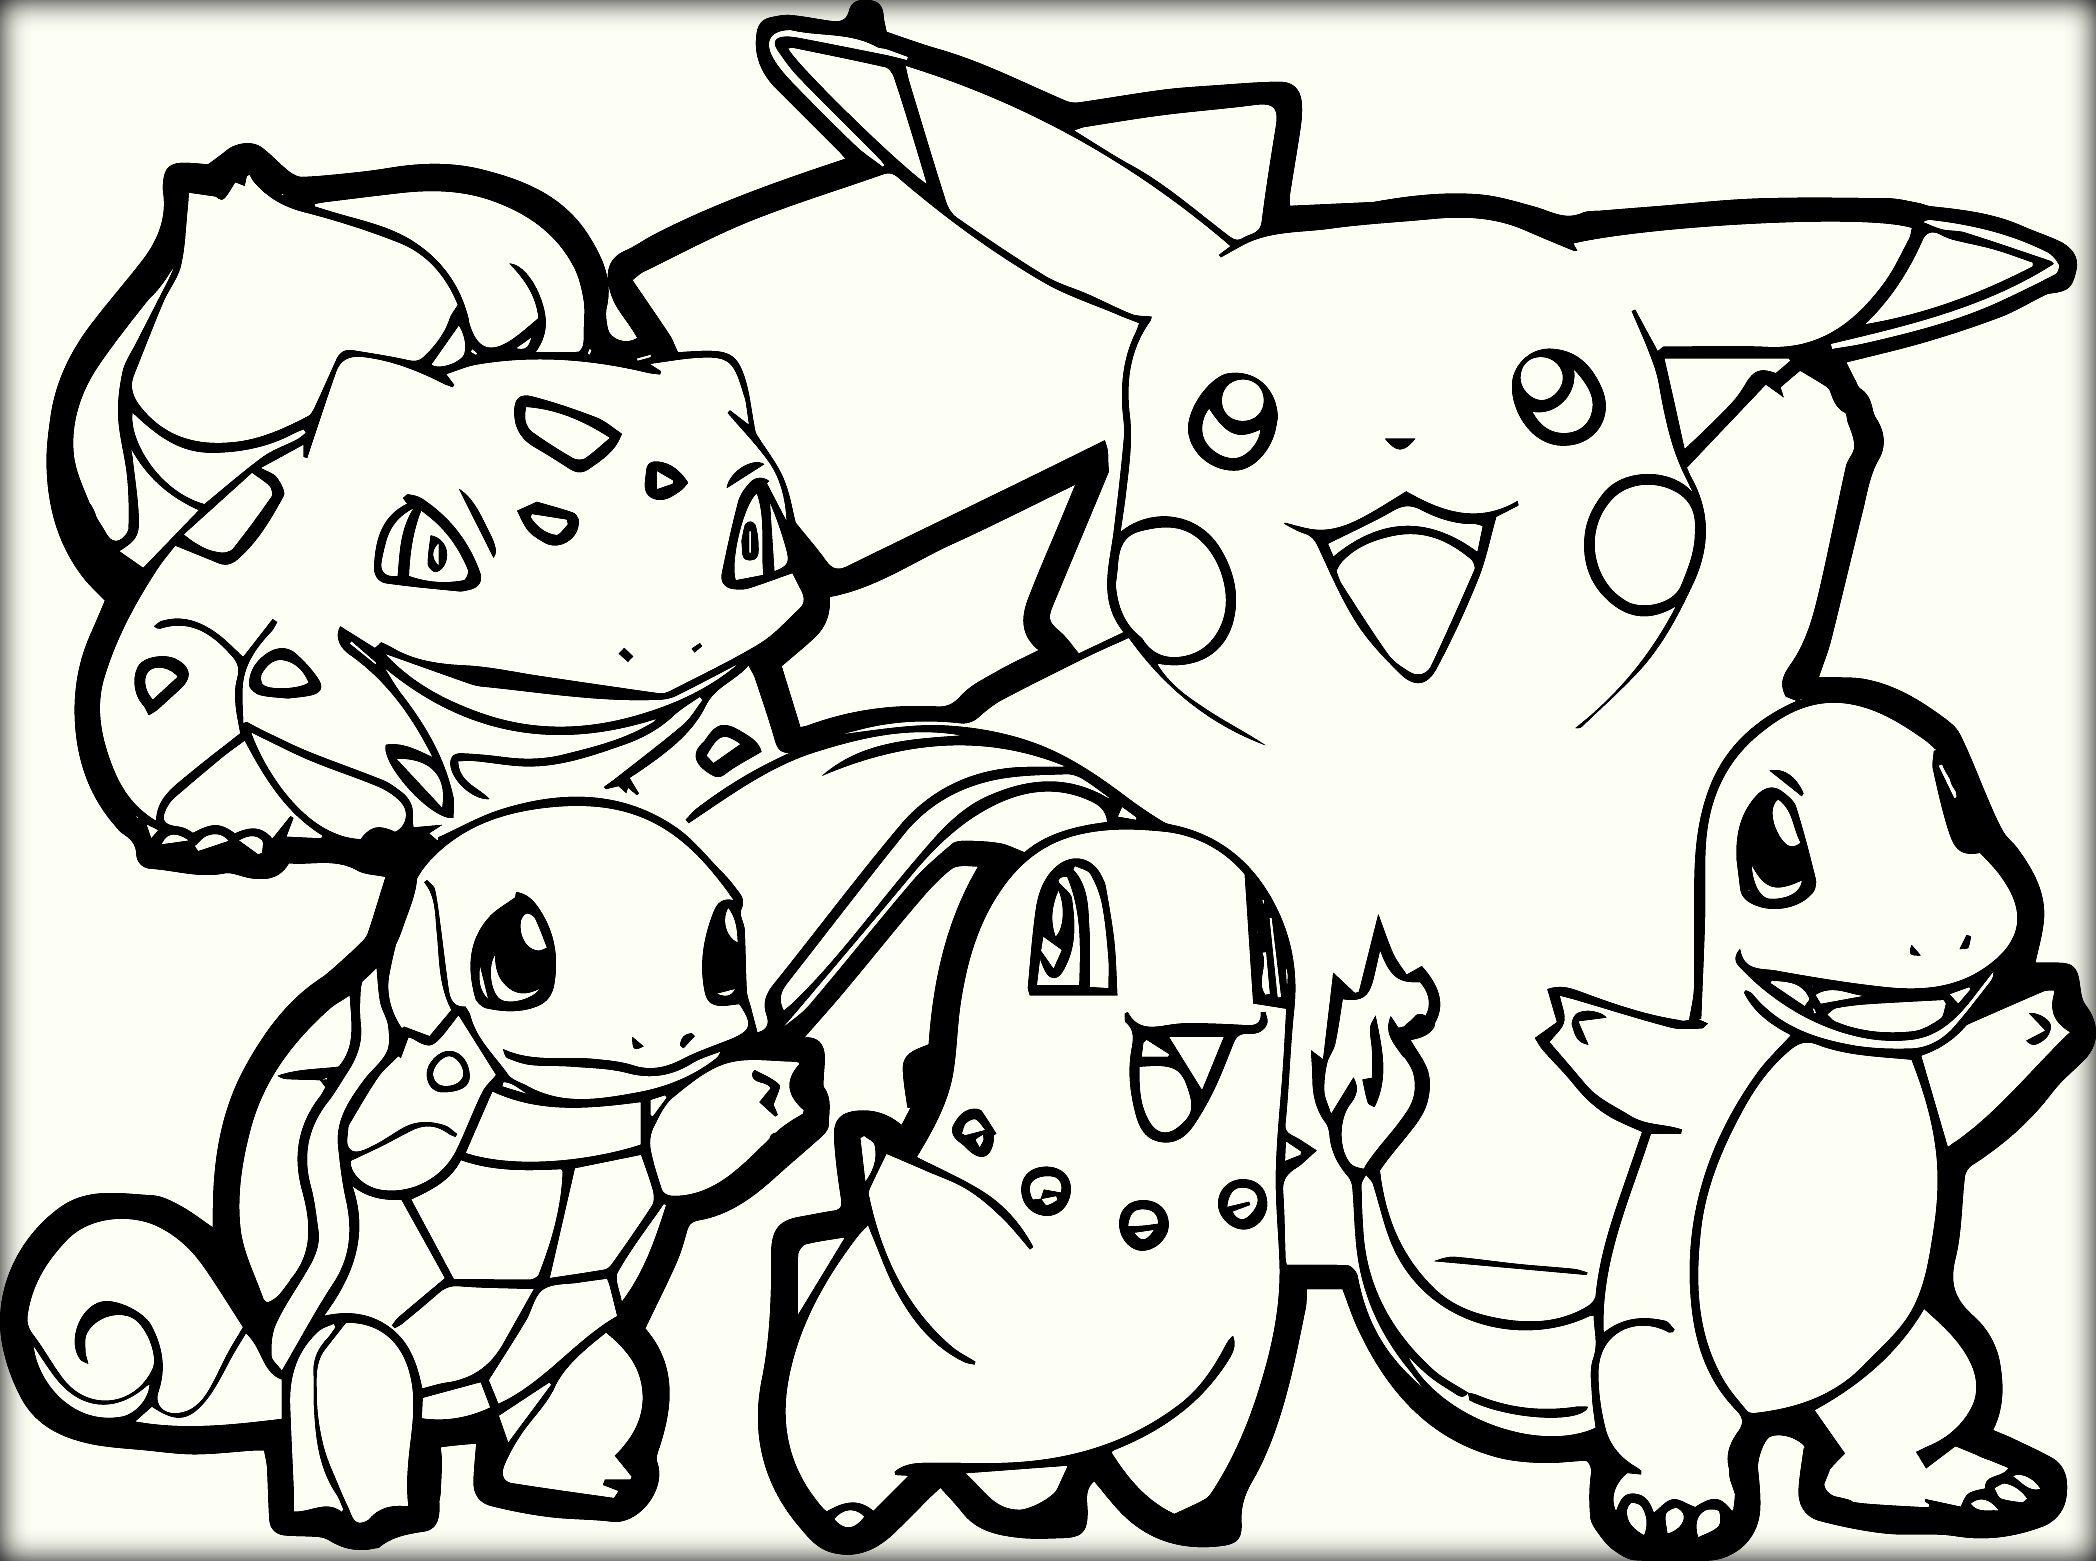 Pelipper Pokemon Coloring Page - Free Pokémon Coloring Pages ... | 1561x2096